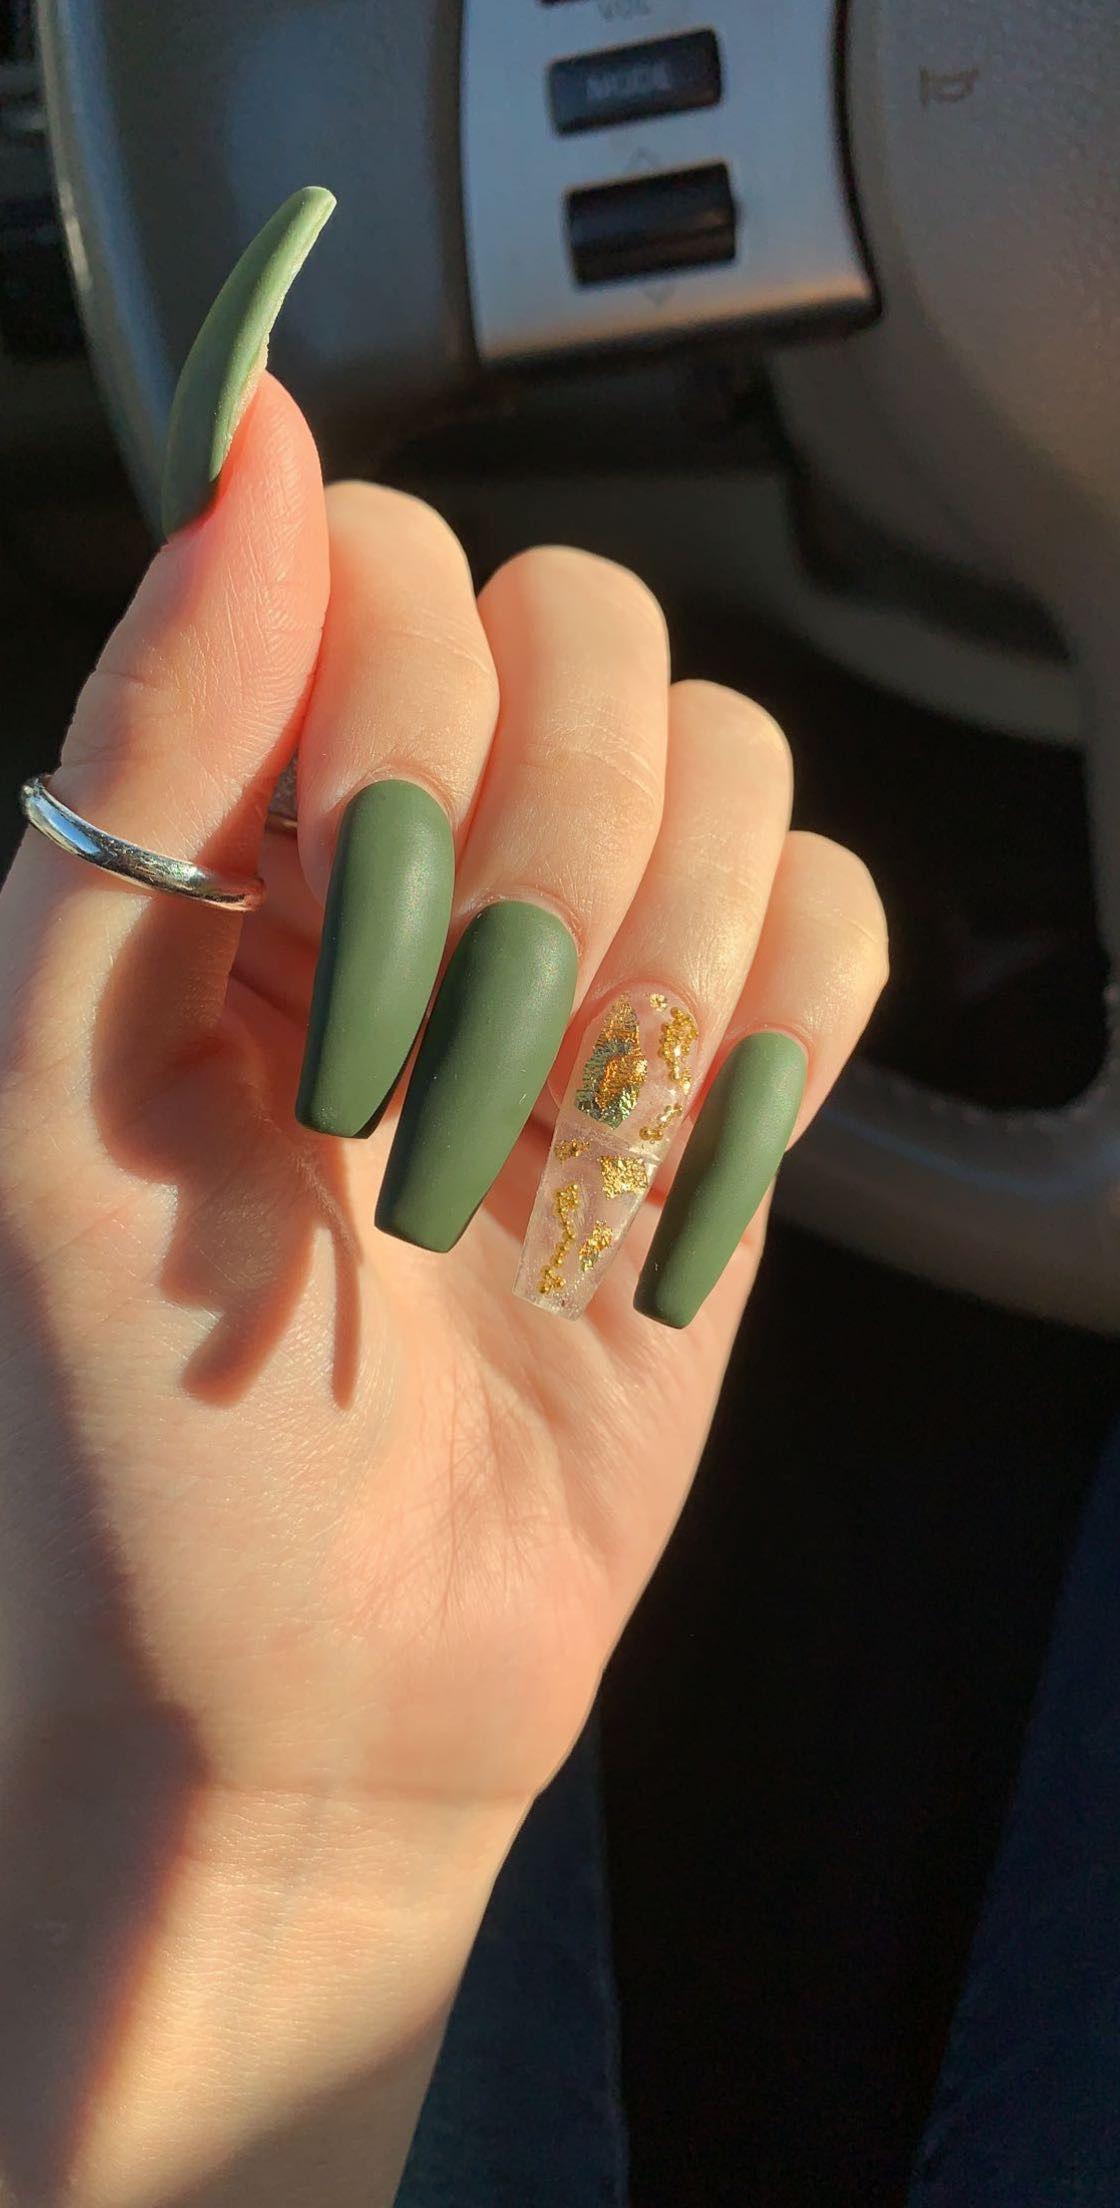 Fall Green Gold Flake Transparent Nails Gold Acrylic Nails Green Acrylic Nails Transparent Nails